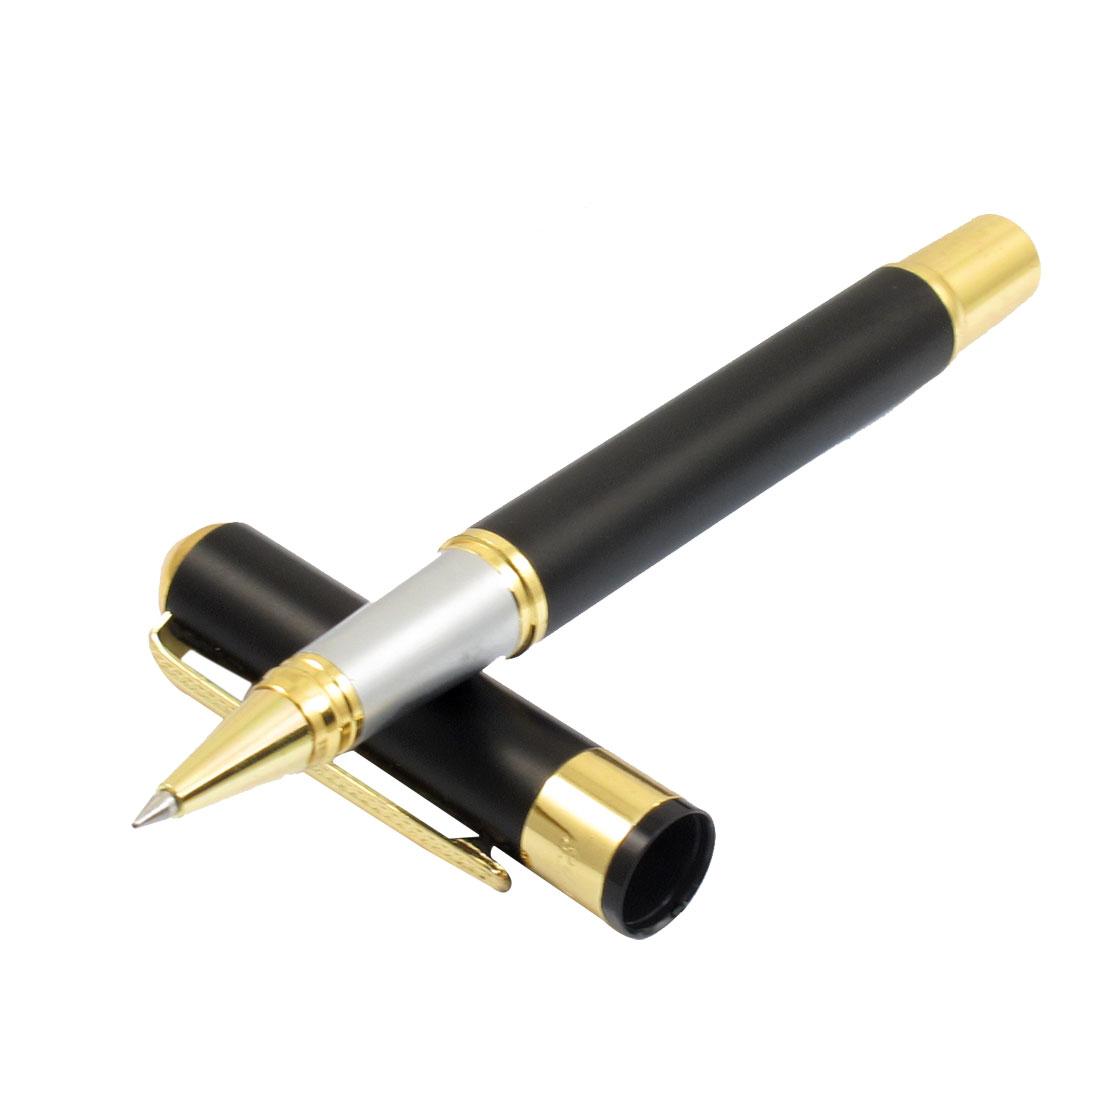 Student 0.5mm Nib Black Ink Writing Alloy Case Stationery Gel Pen